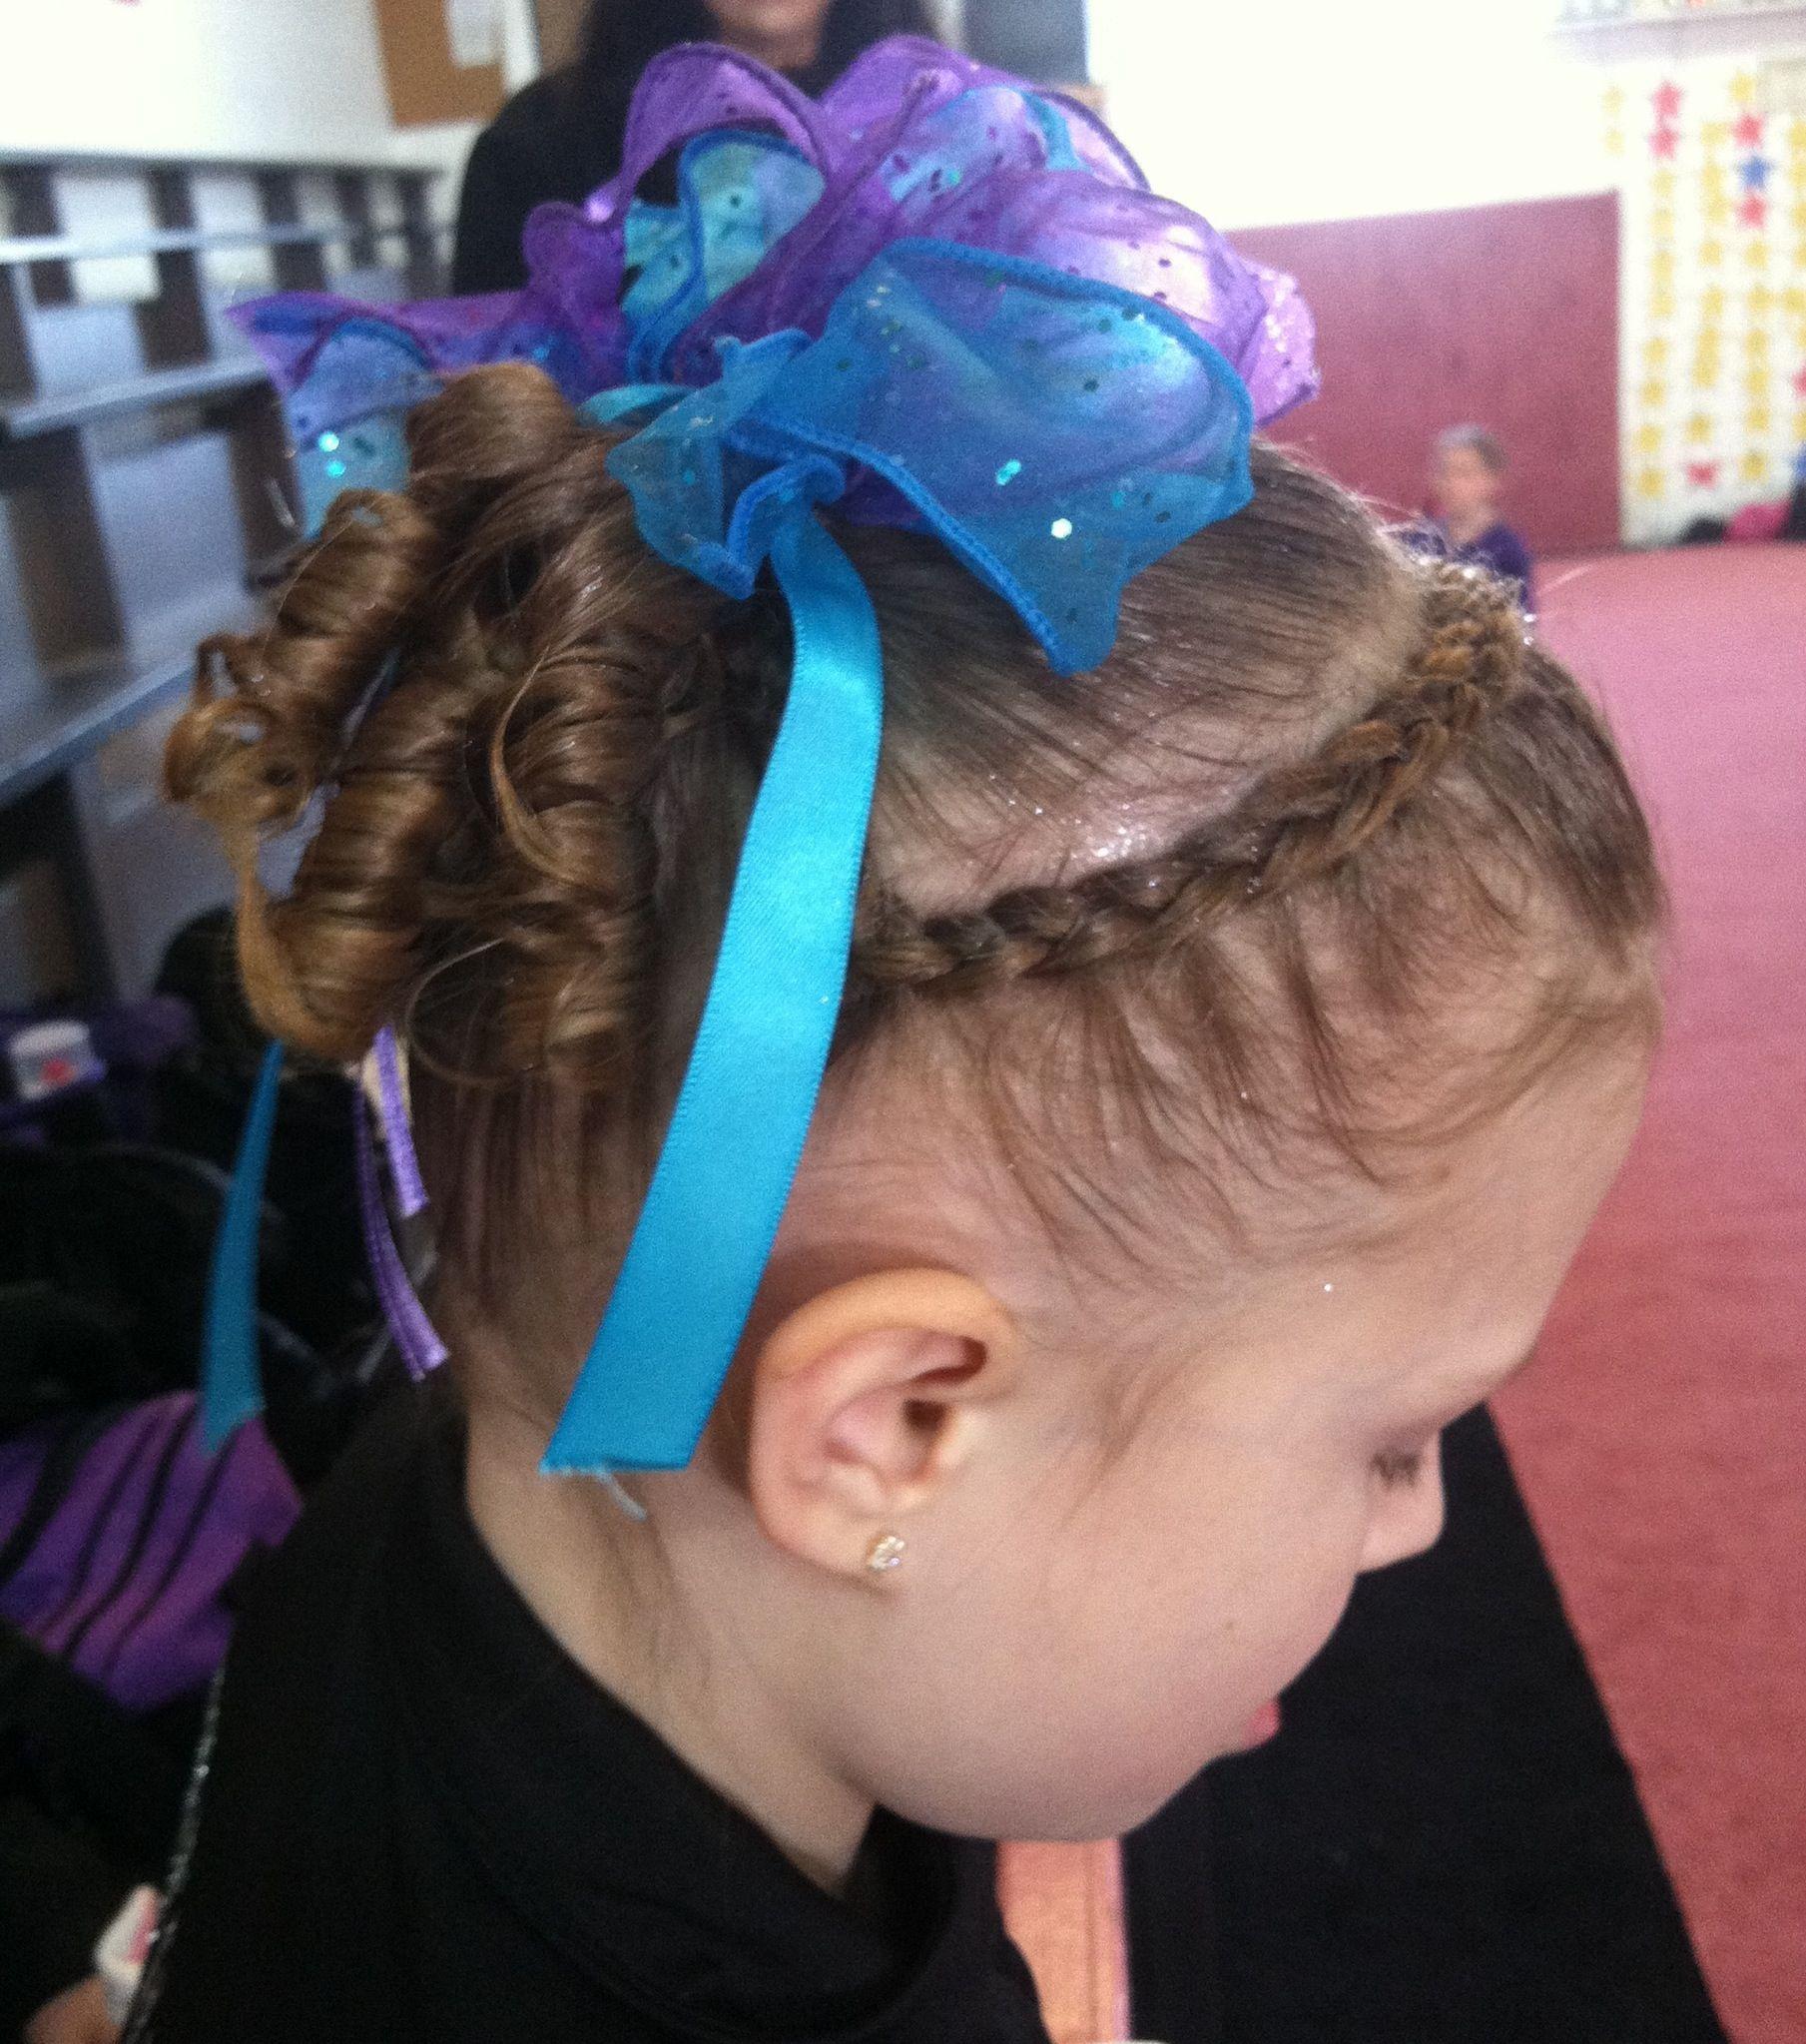 Cute gymnastics hairstyle headband braid into curly pigtails hair